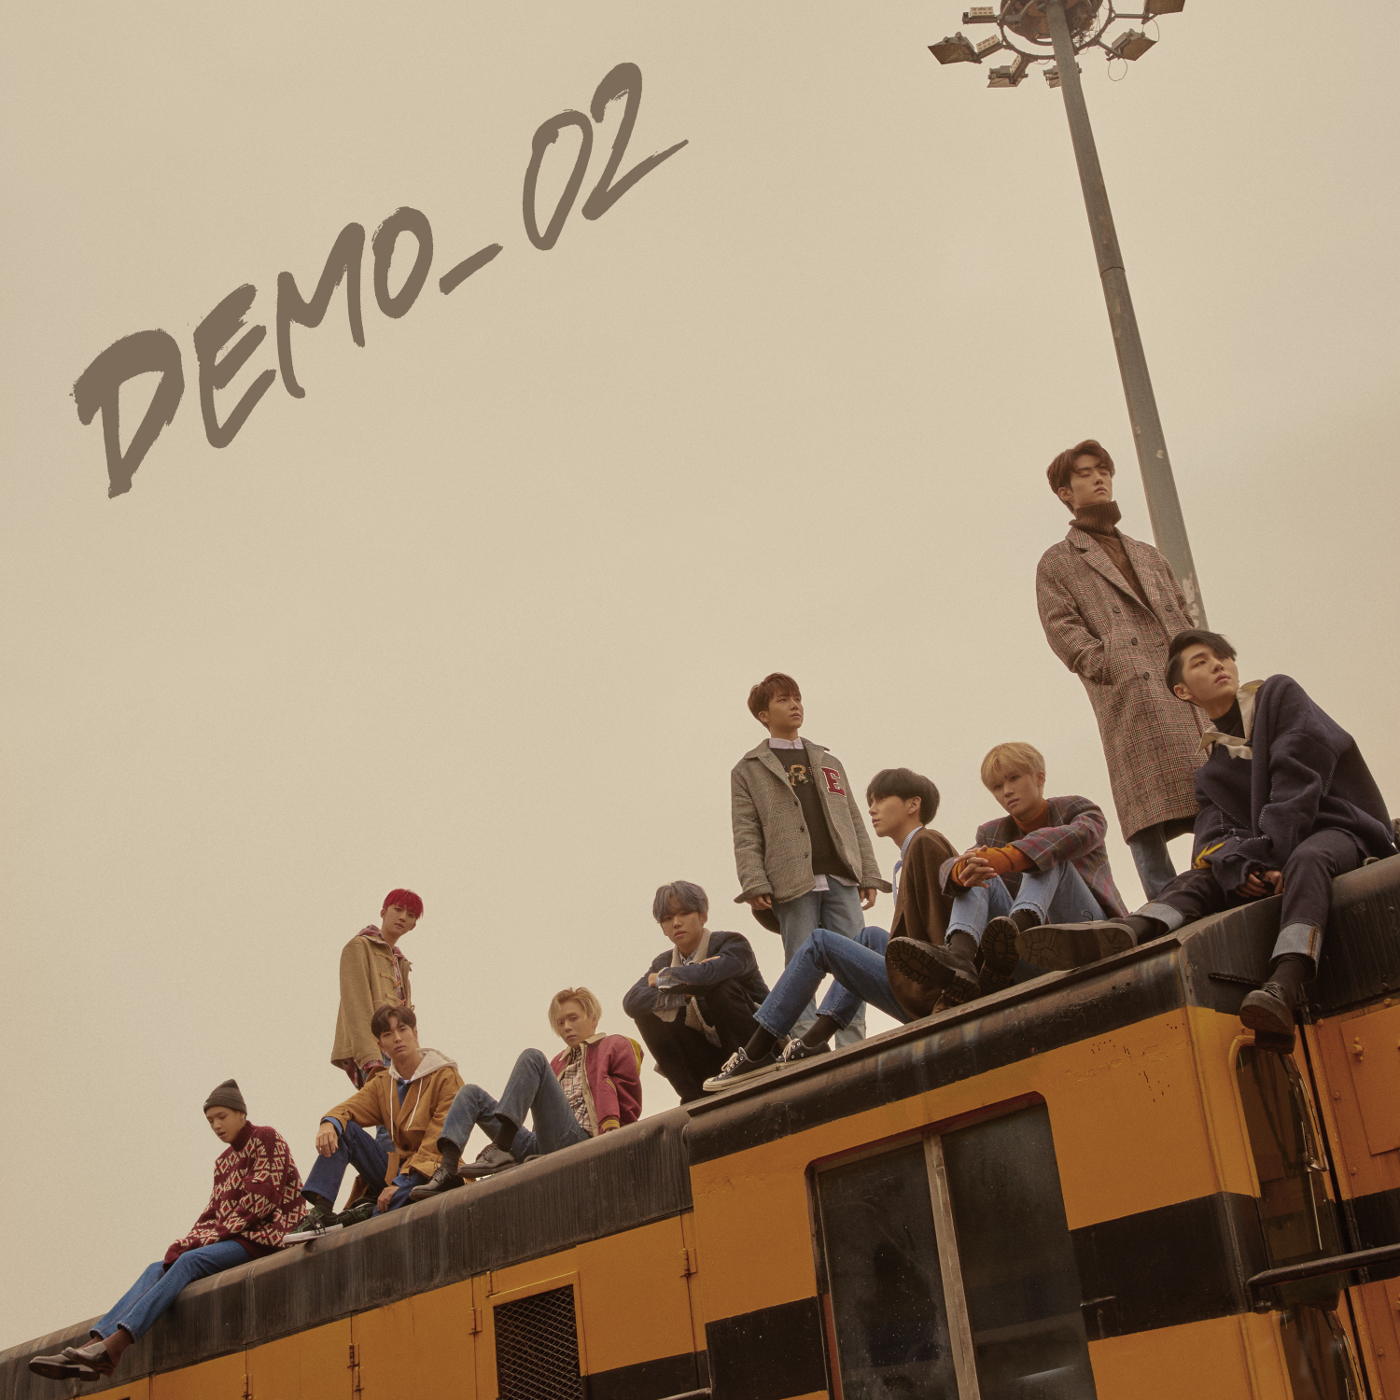 Demo 02